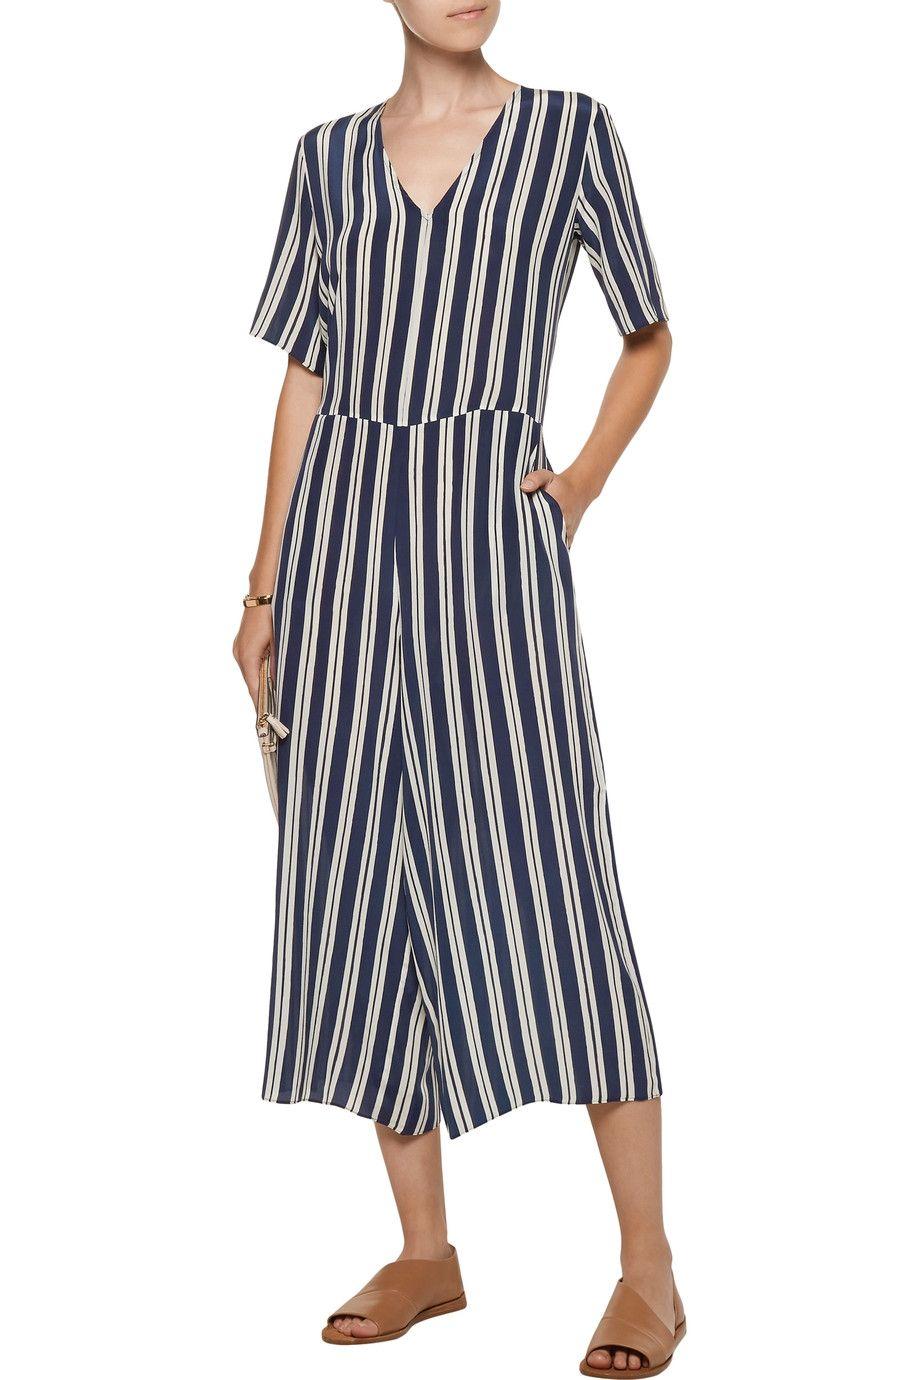 54cc86c2f72 Shop on-sale M.i.h Jeans Hart cropped striped silk jumpsuit. Browse other  discount designer